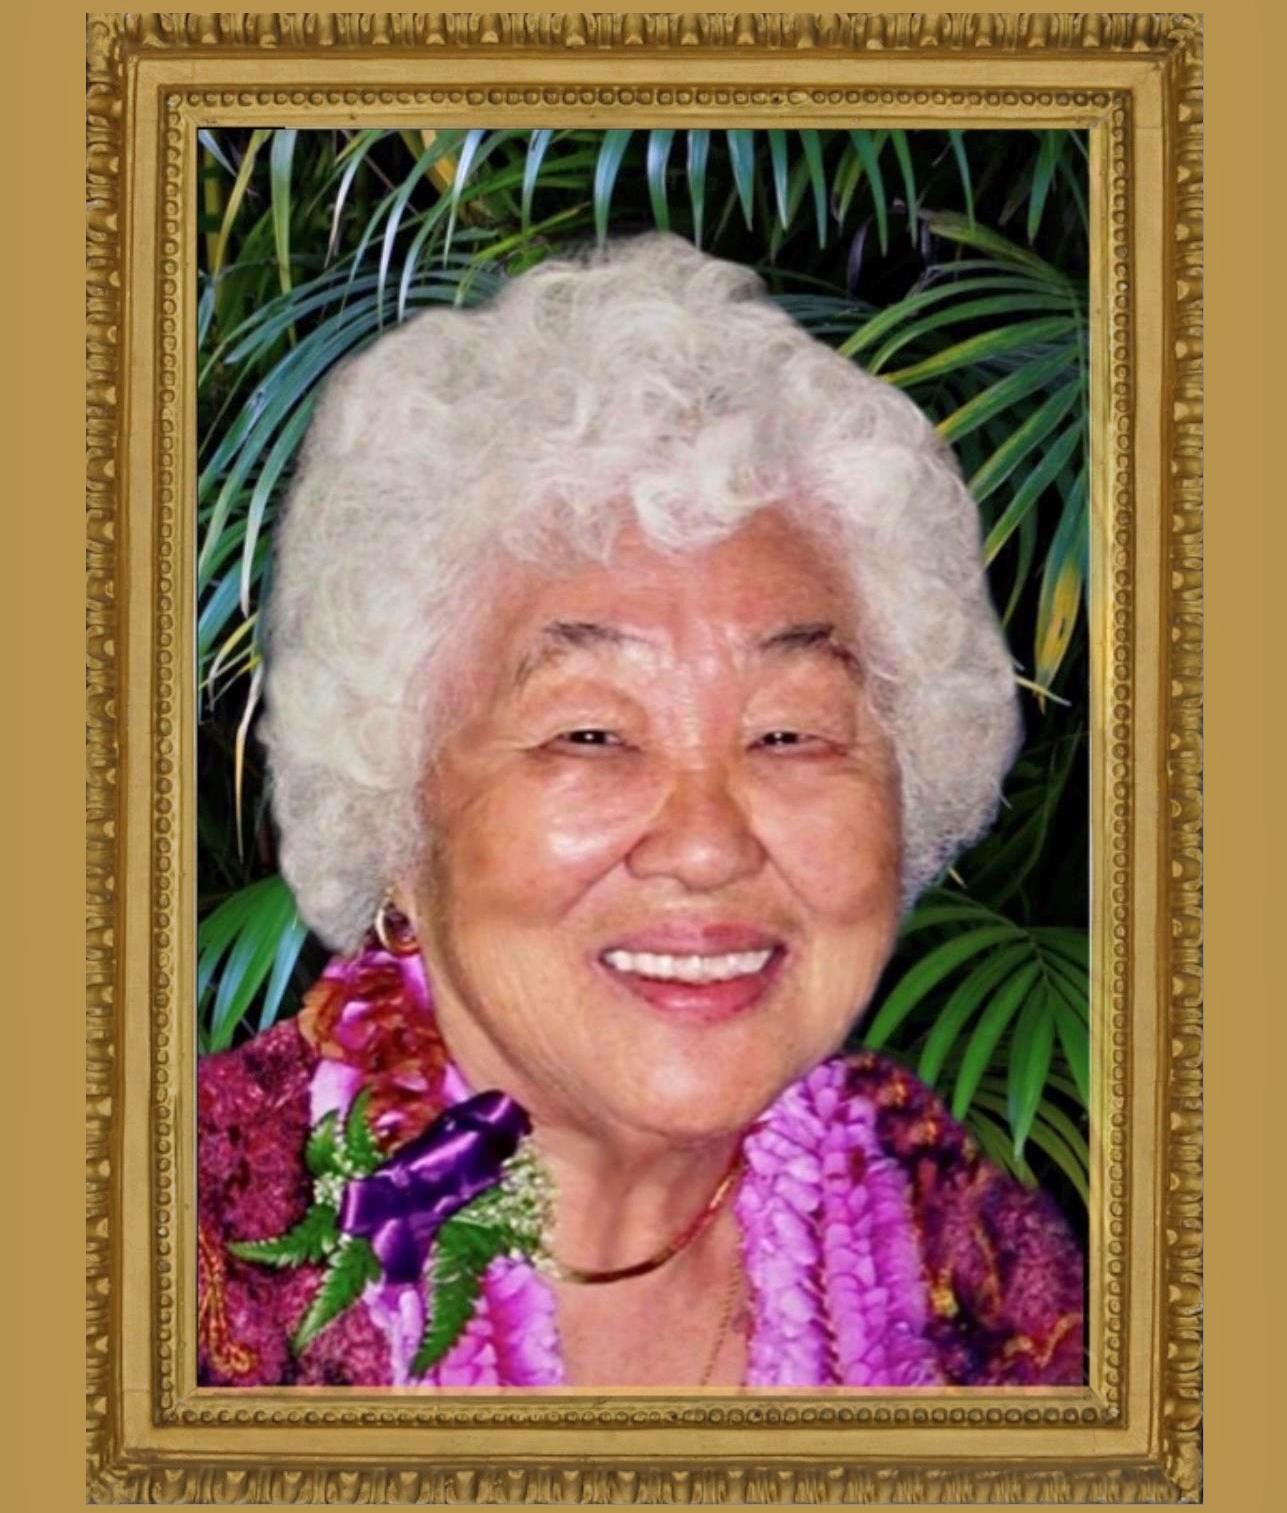 Helen H. Ching Chow